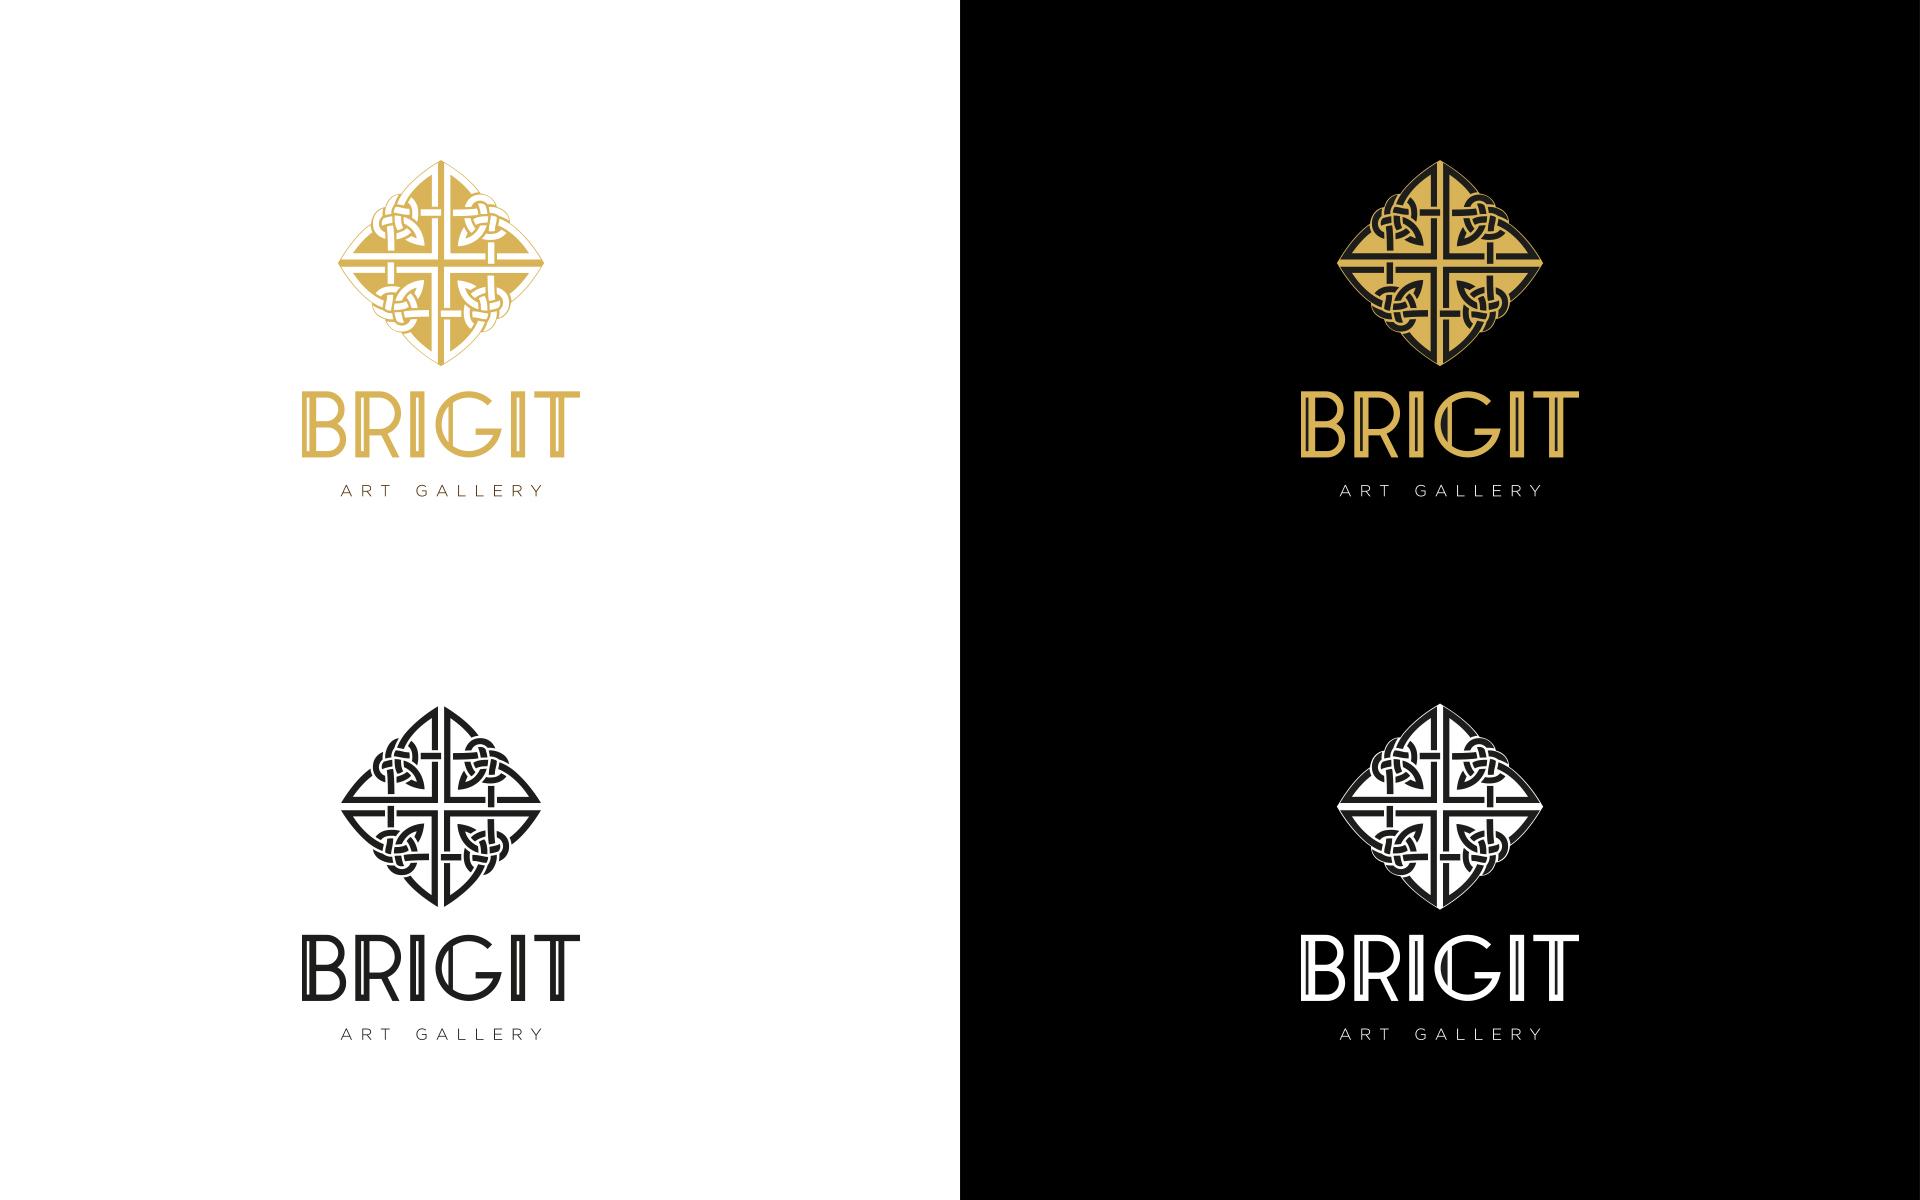 brigit logo design.jpg